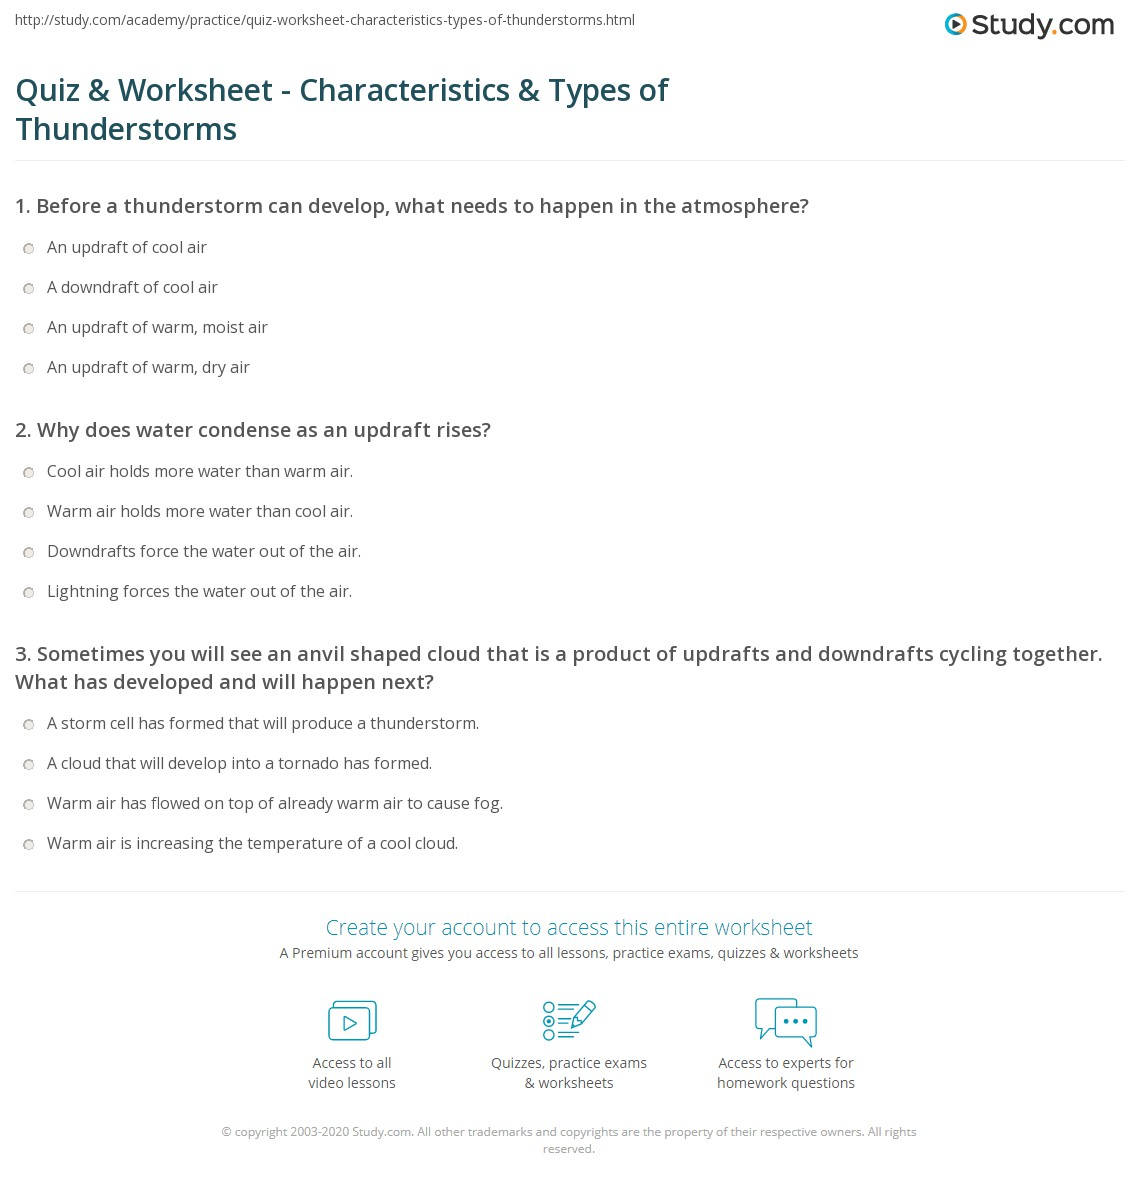 Quiz & Worksheet - Characteristics & Types of Thunderstorms ...